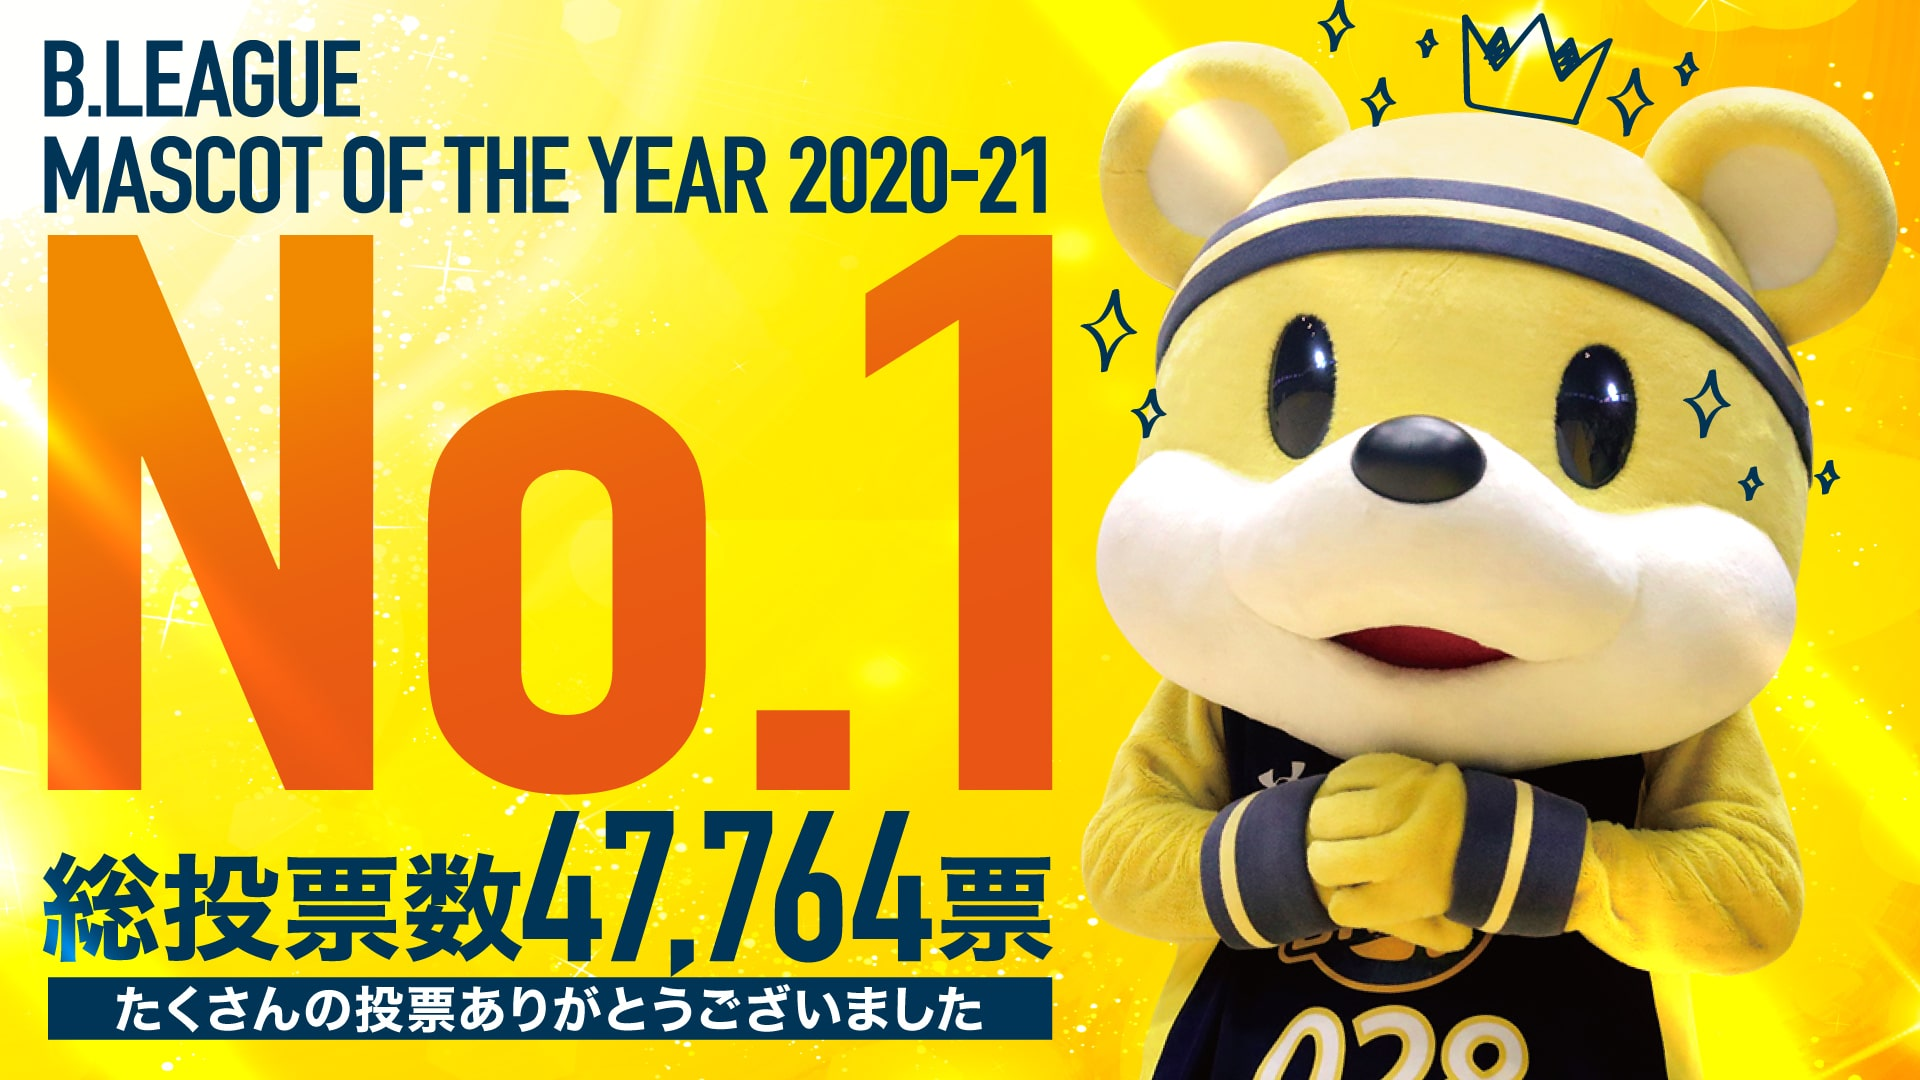 B.LEAGUE MASCOT OF THE YEAR 2020-21 ブレッキー No.1